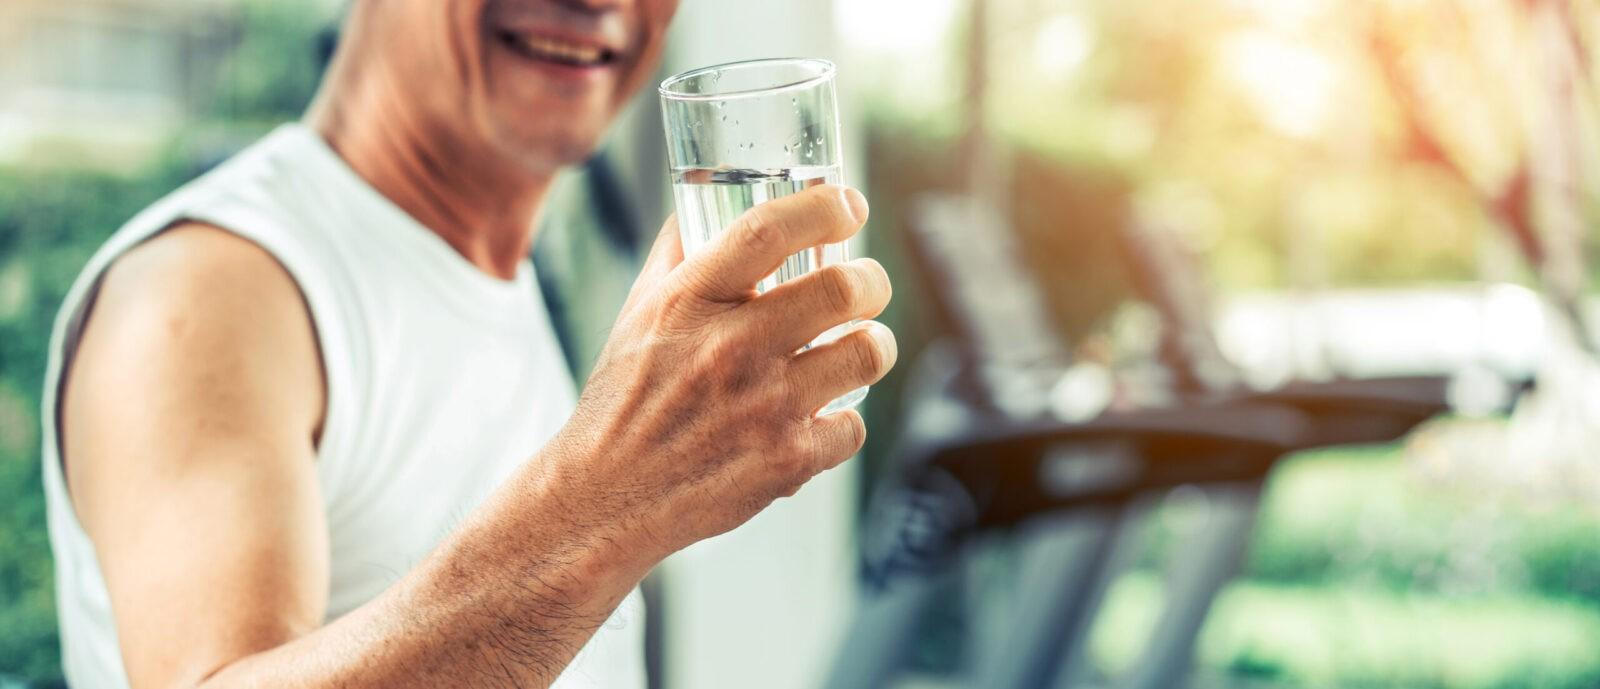 importancia beber agua con una dieta rica en fibra